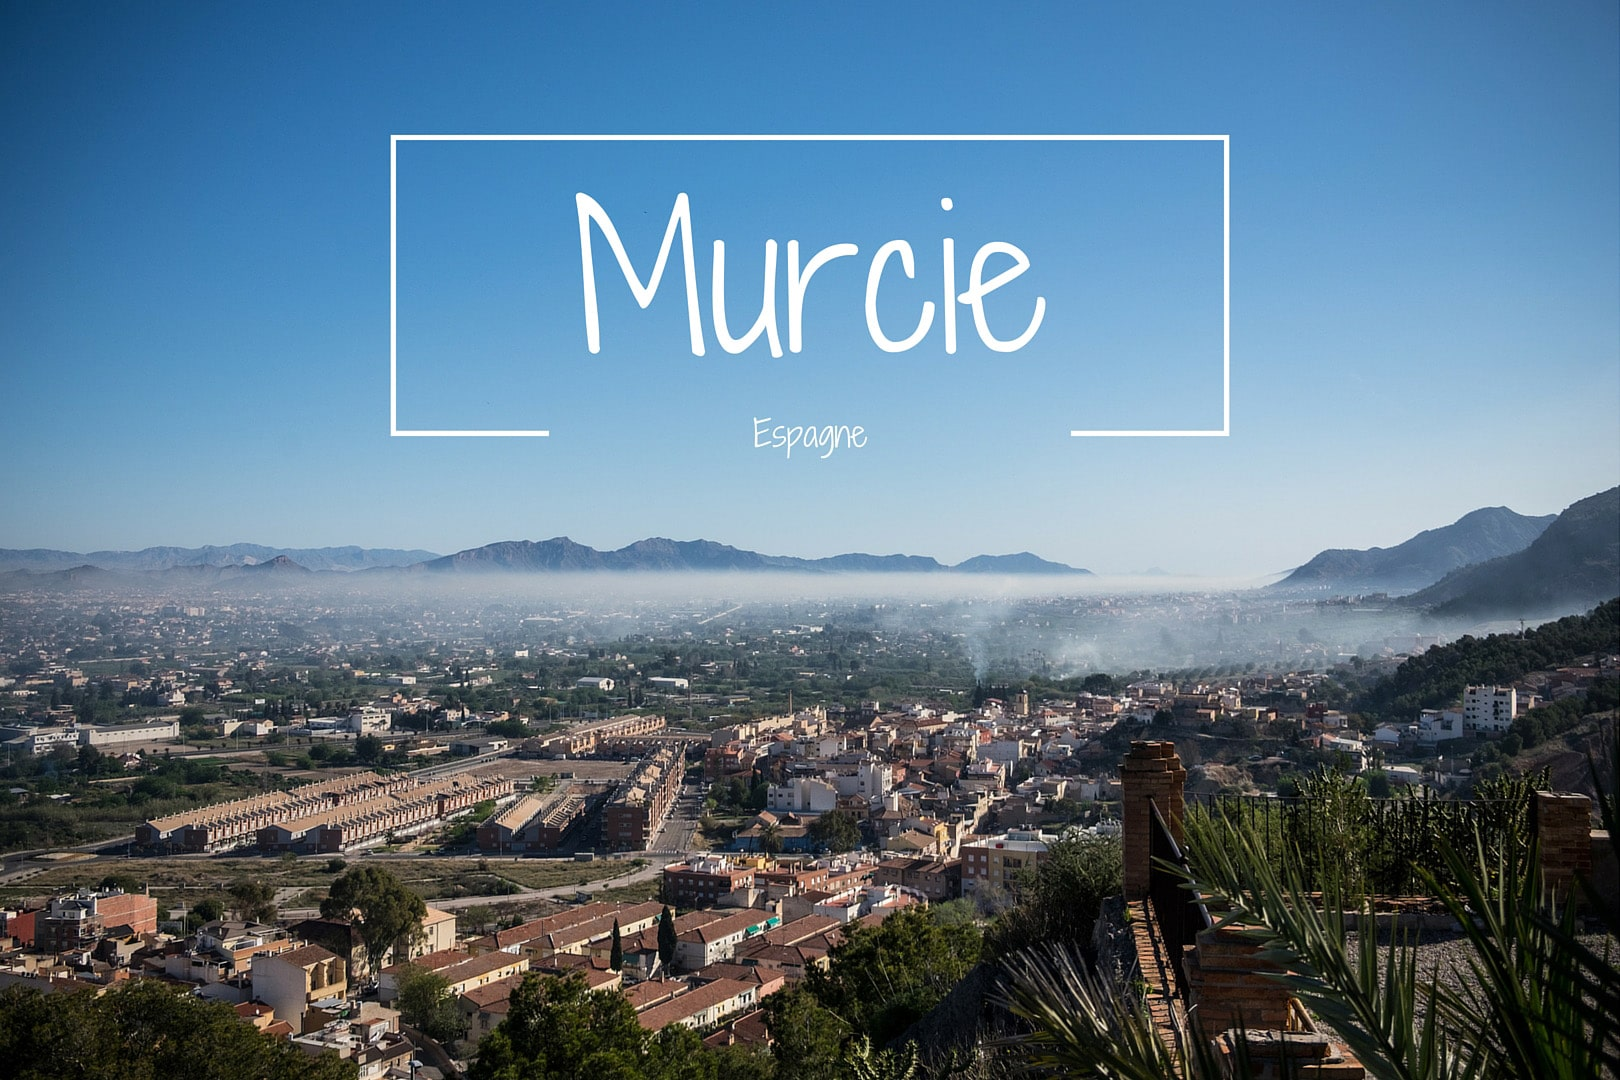 Murcie Espagne Blog voyage LoveLiveTravel